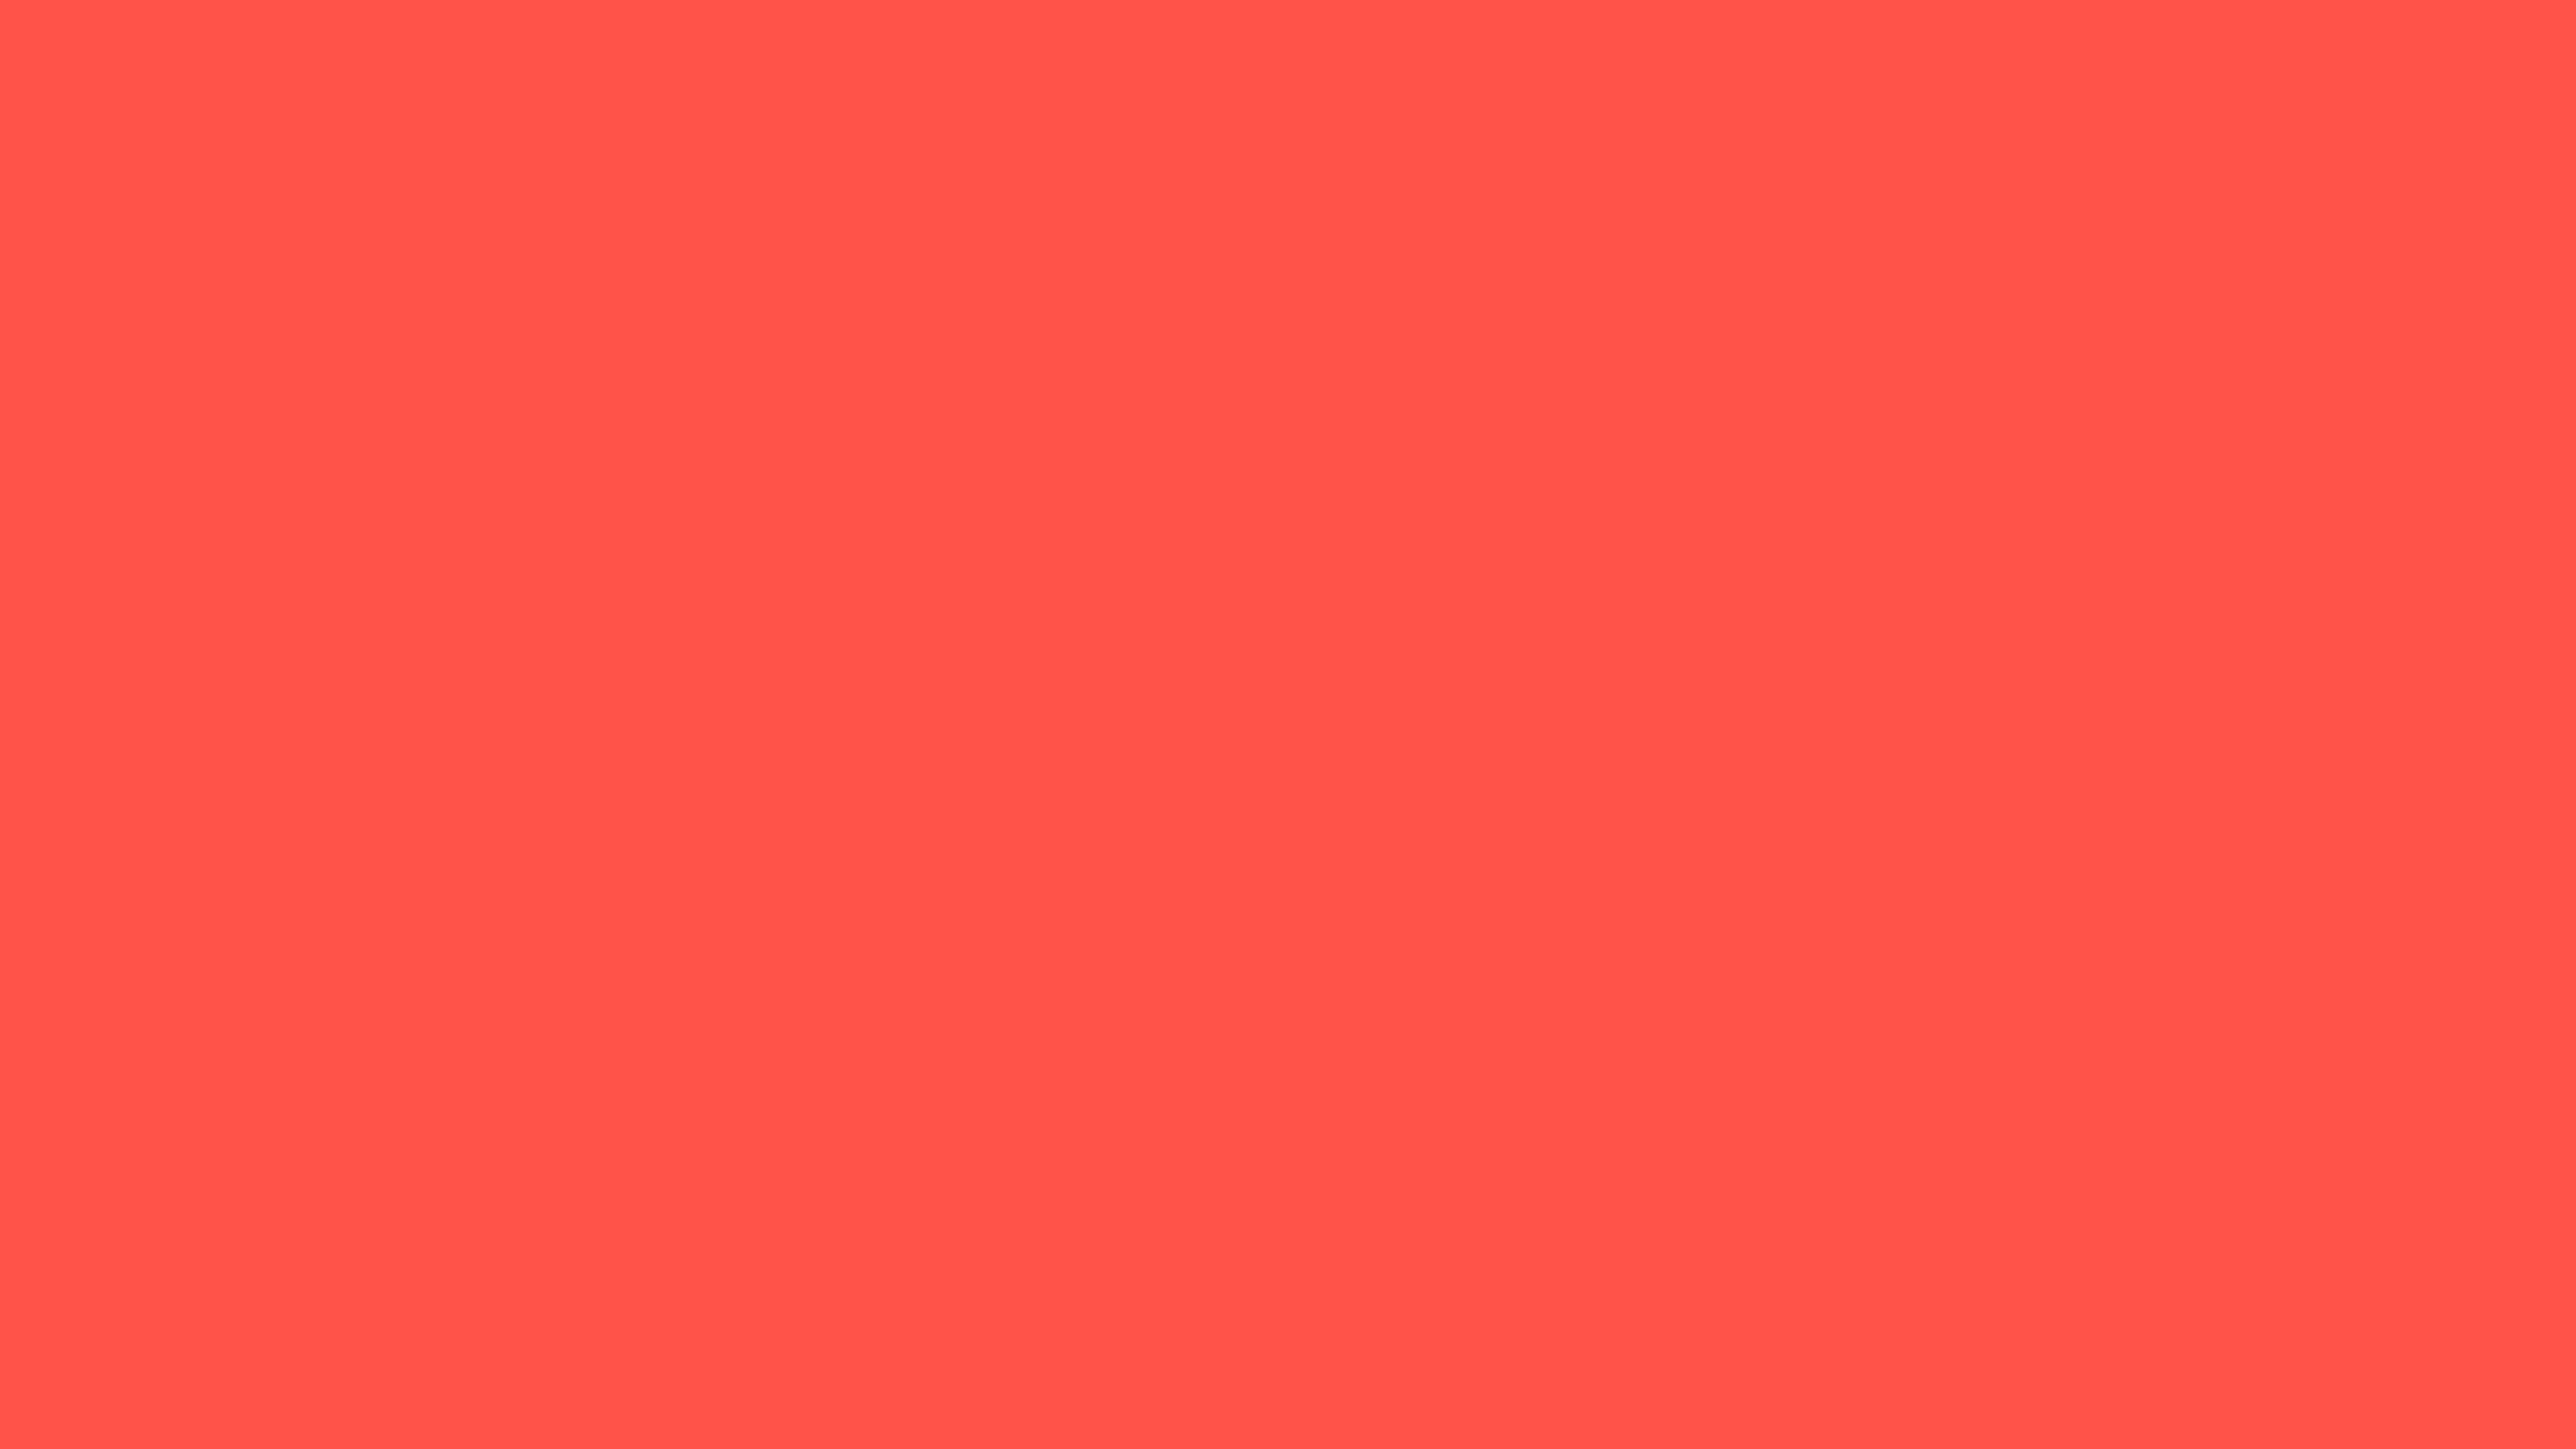 5120x2880 Red-orange Solid Color Background